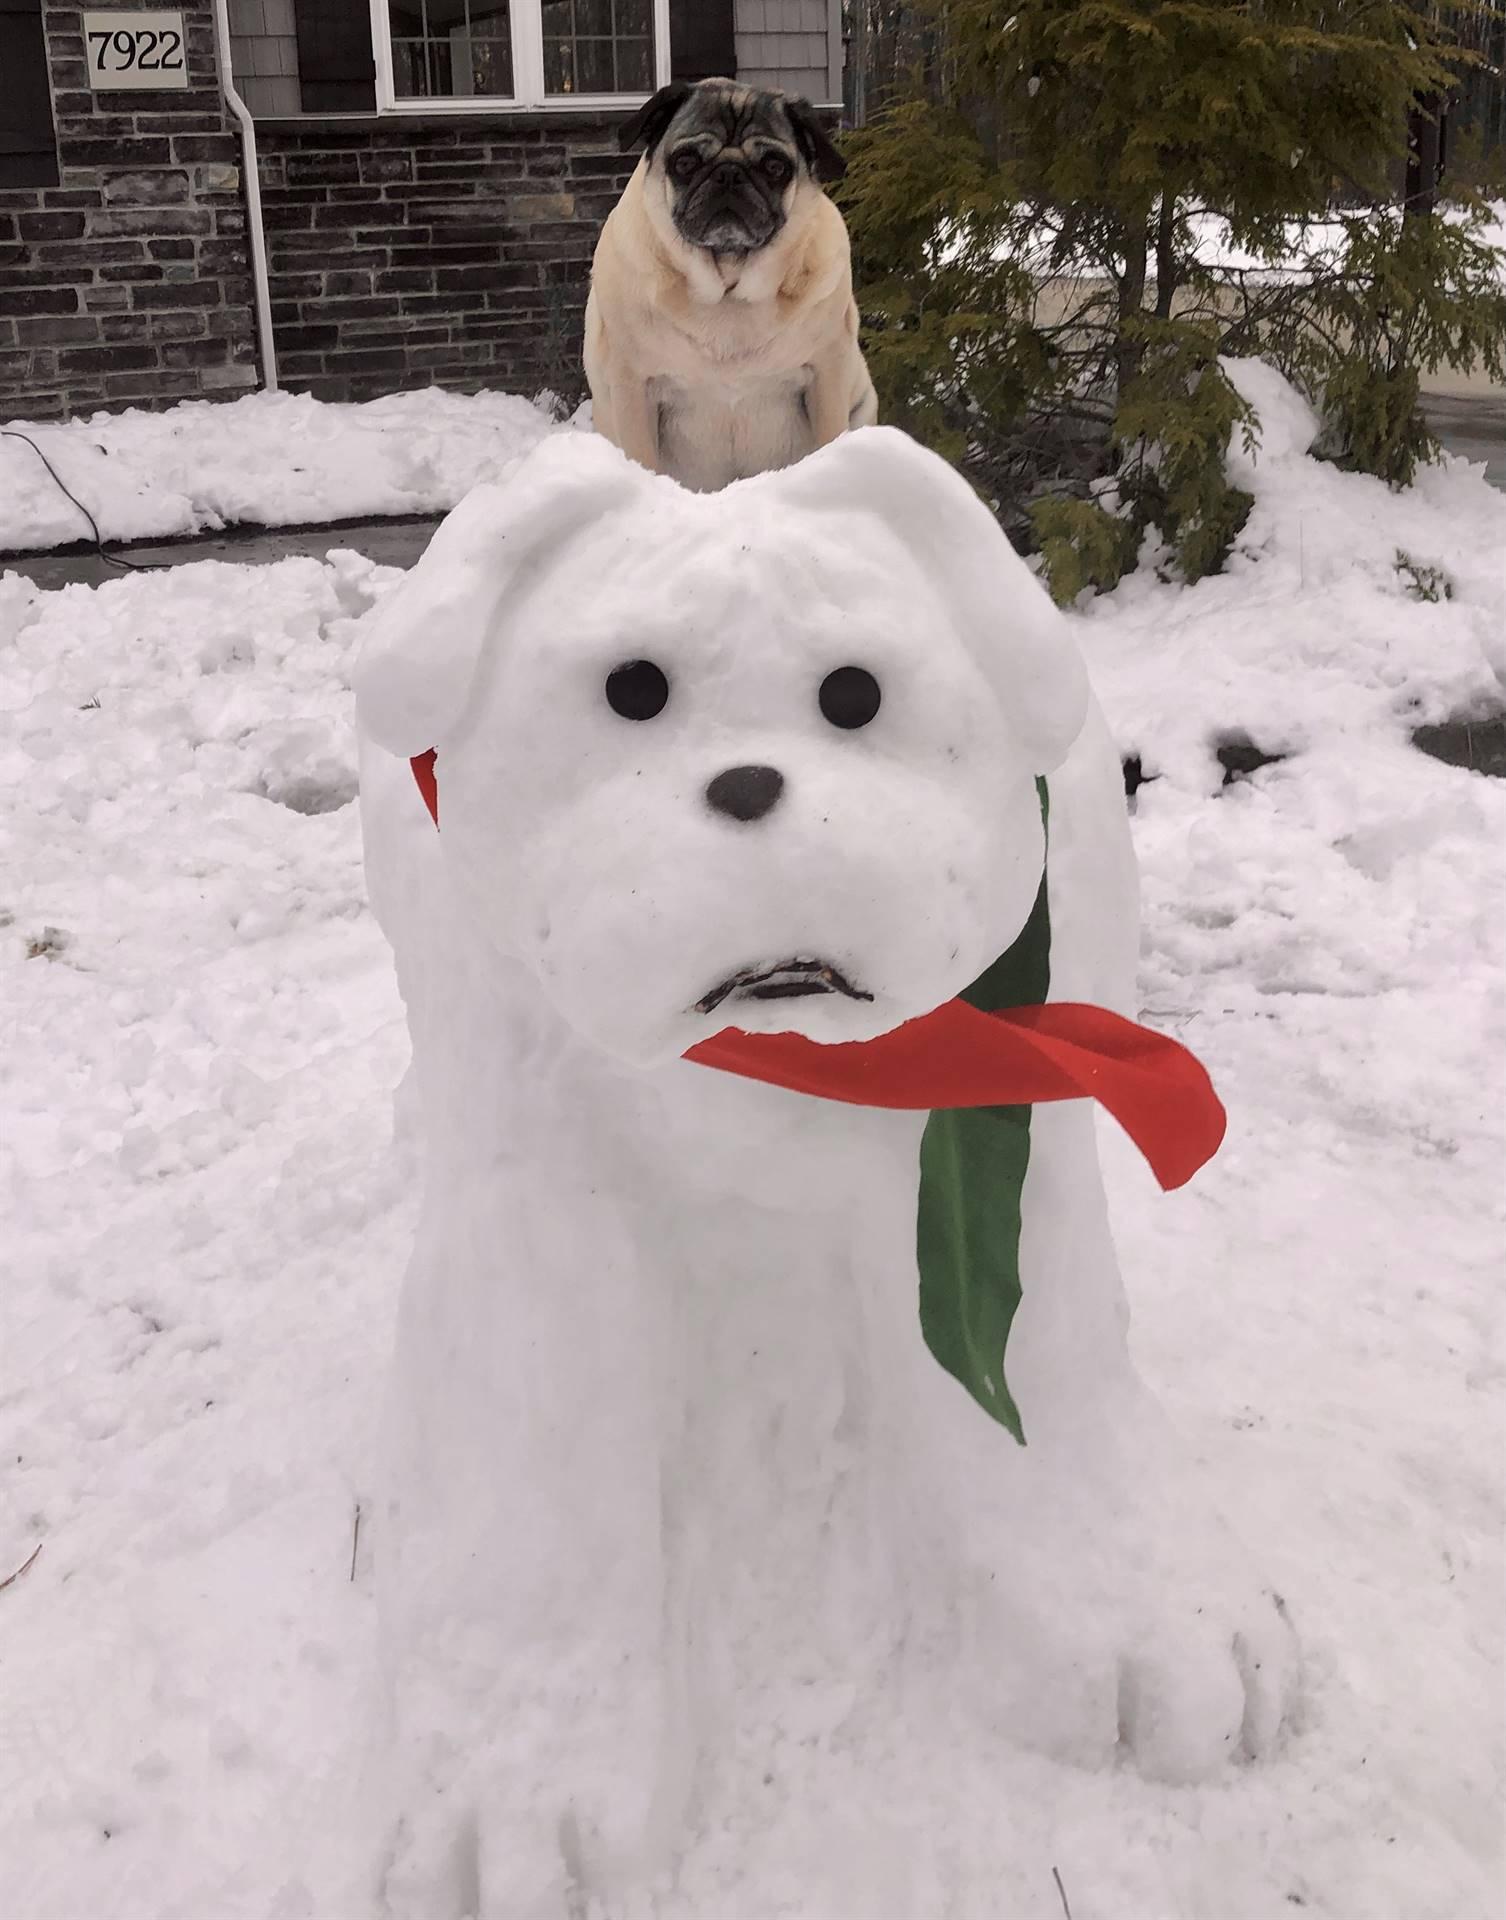 Snowman Building Contest Winner!